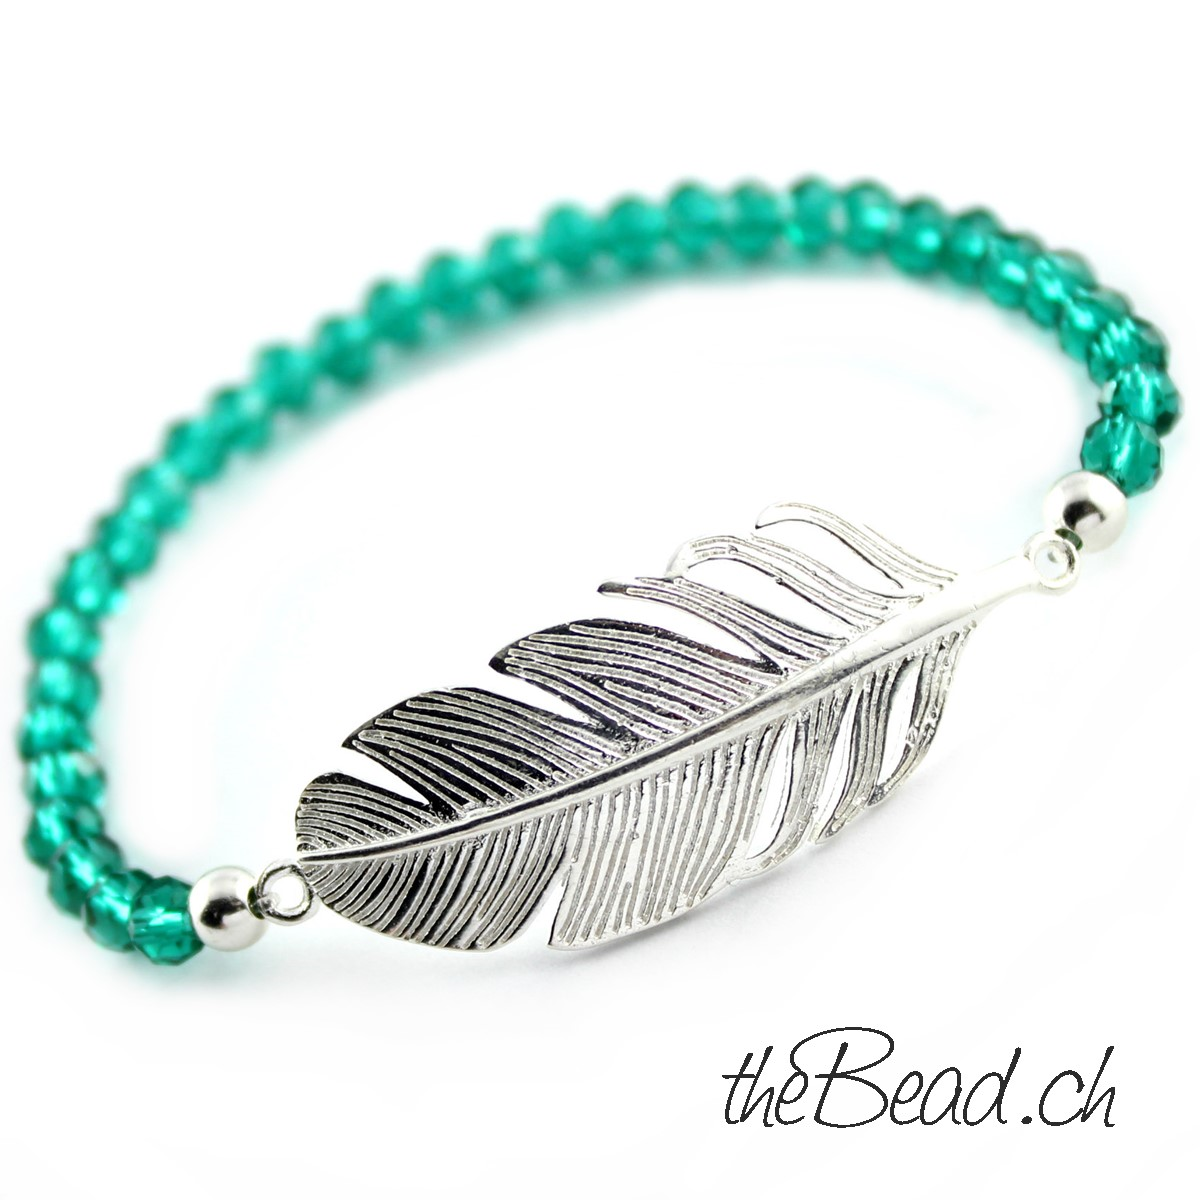 http://www.thebead.ch/product_info.php?info=p146_925-silber-feder-kristallperlen-armband--smaragdfarben.html